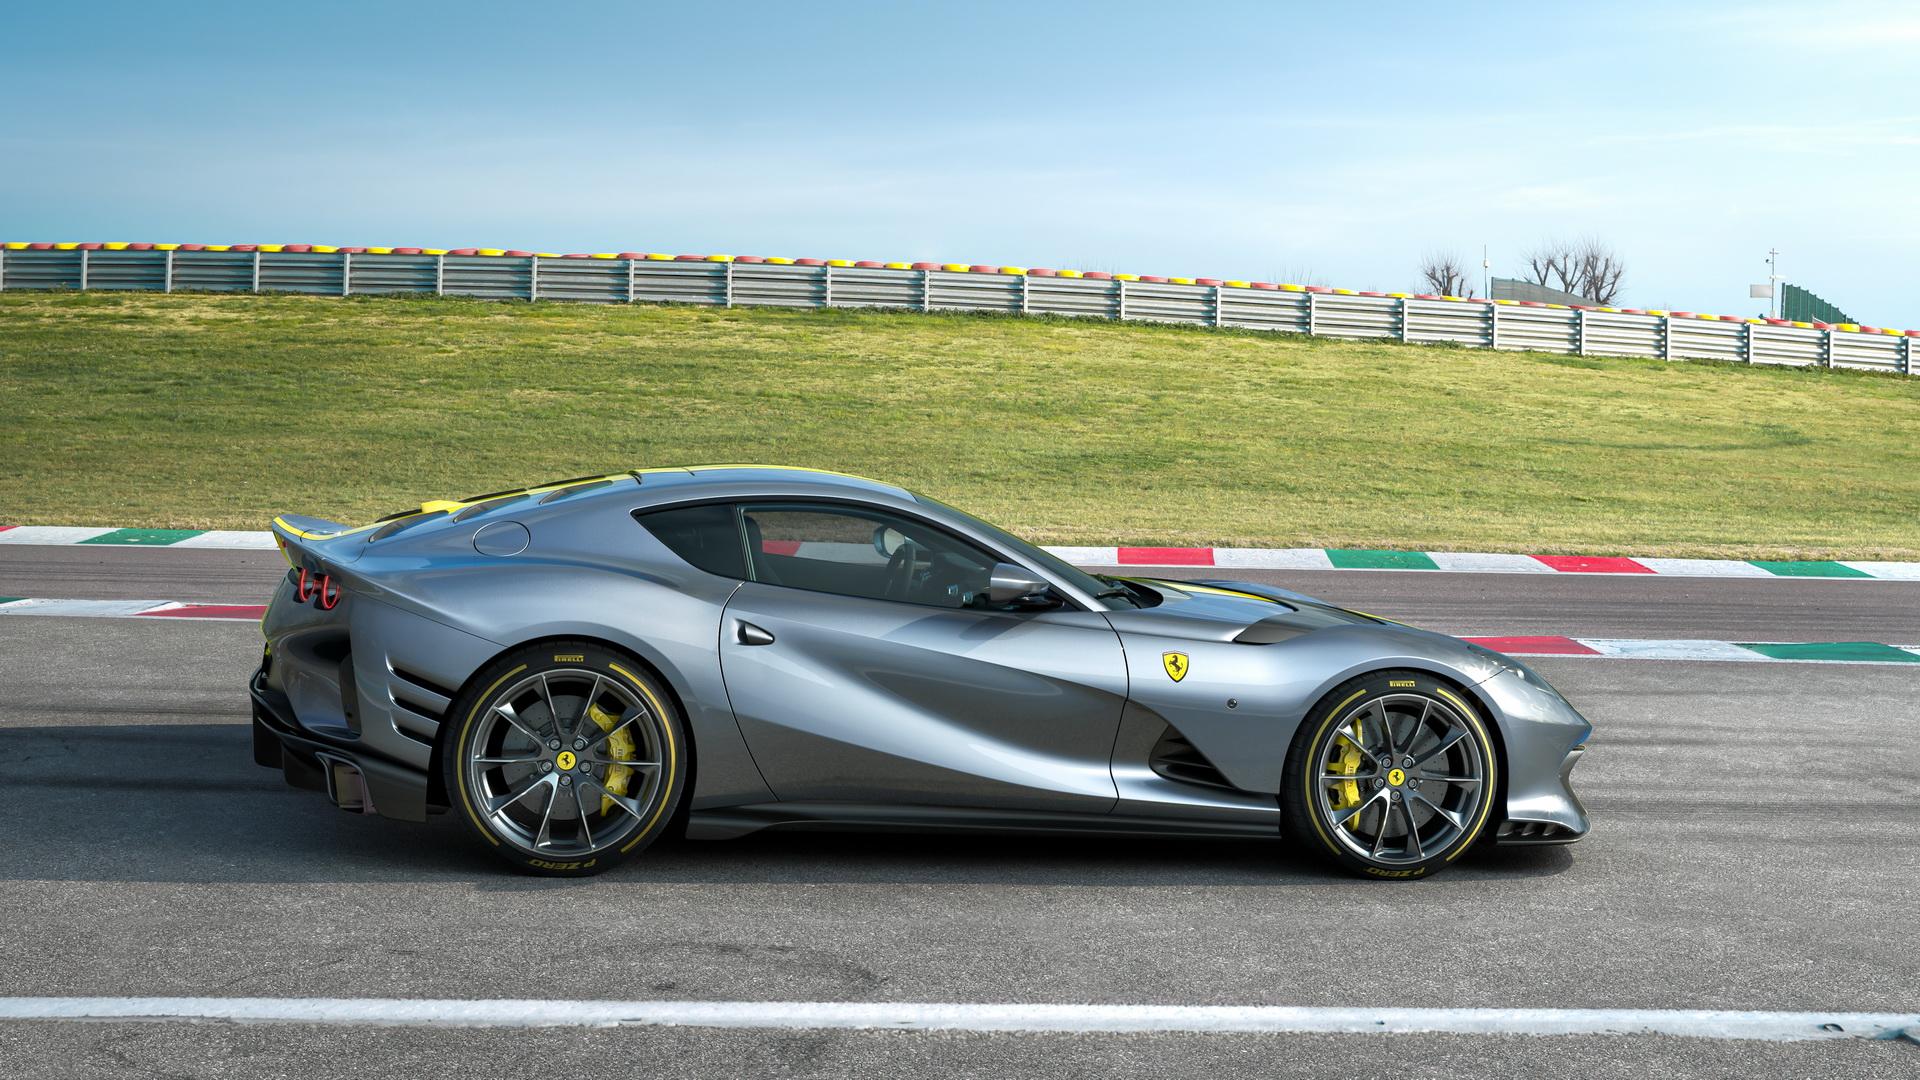 Ferrari-812-giới-hạn-ra-mắt (8).jpg